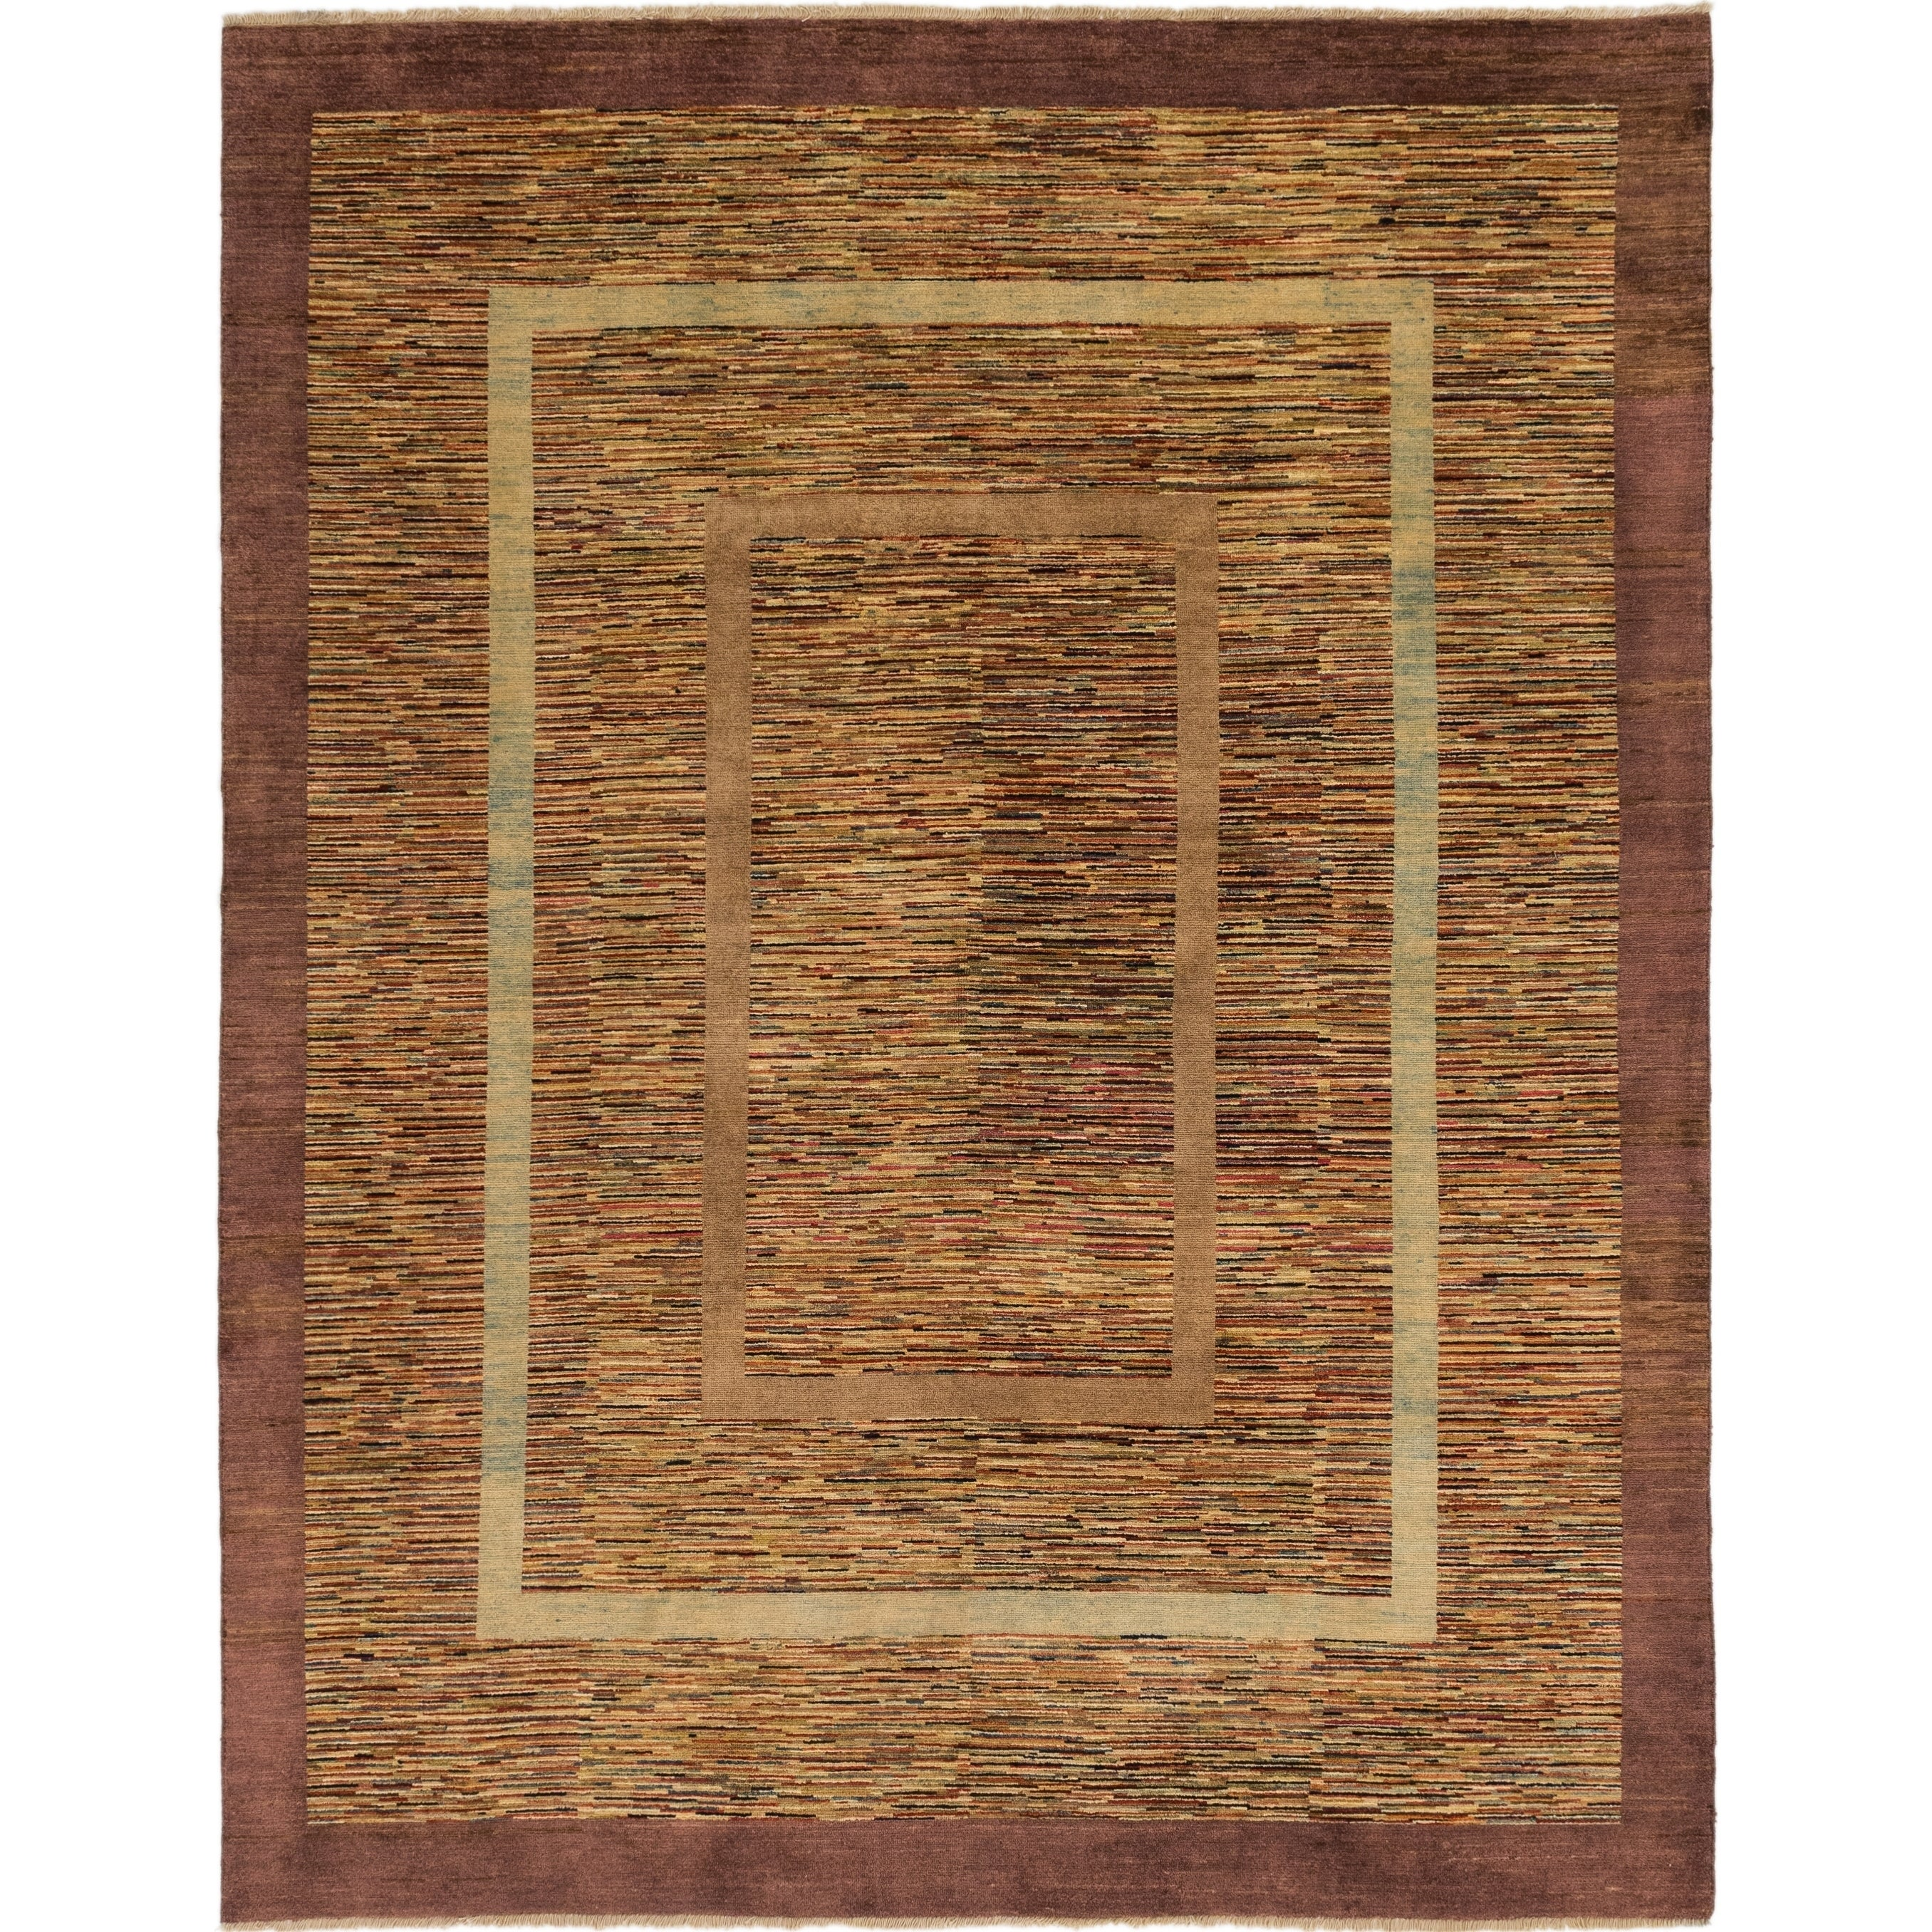 Hand Knotted Kashkuli Gabbeh Wool Area Rug - 8 x 10 4 (Multi - 8 x 10 4)